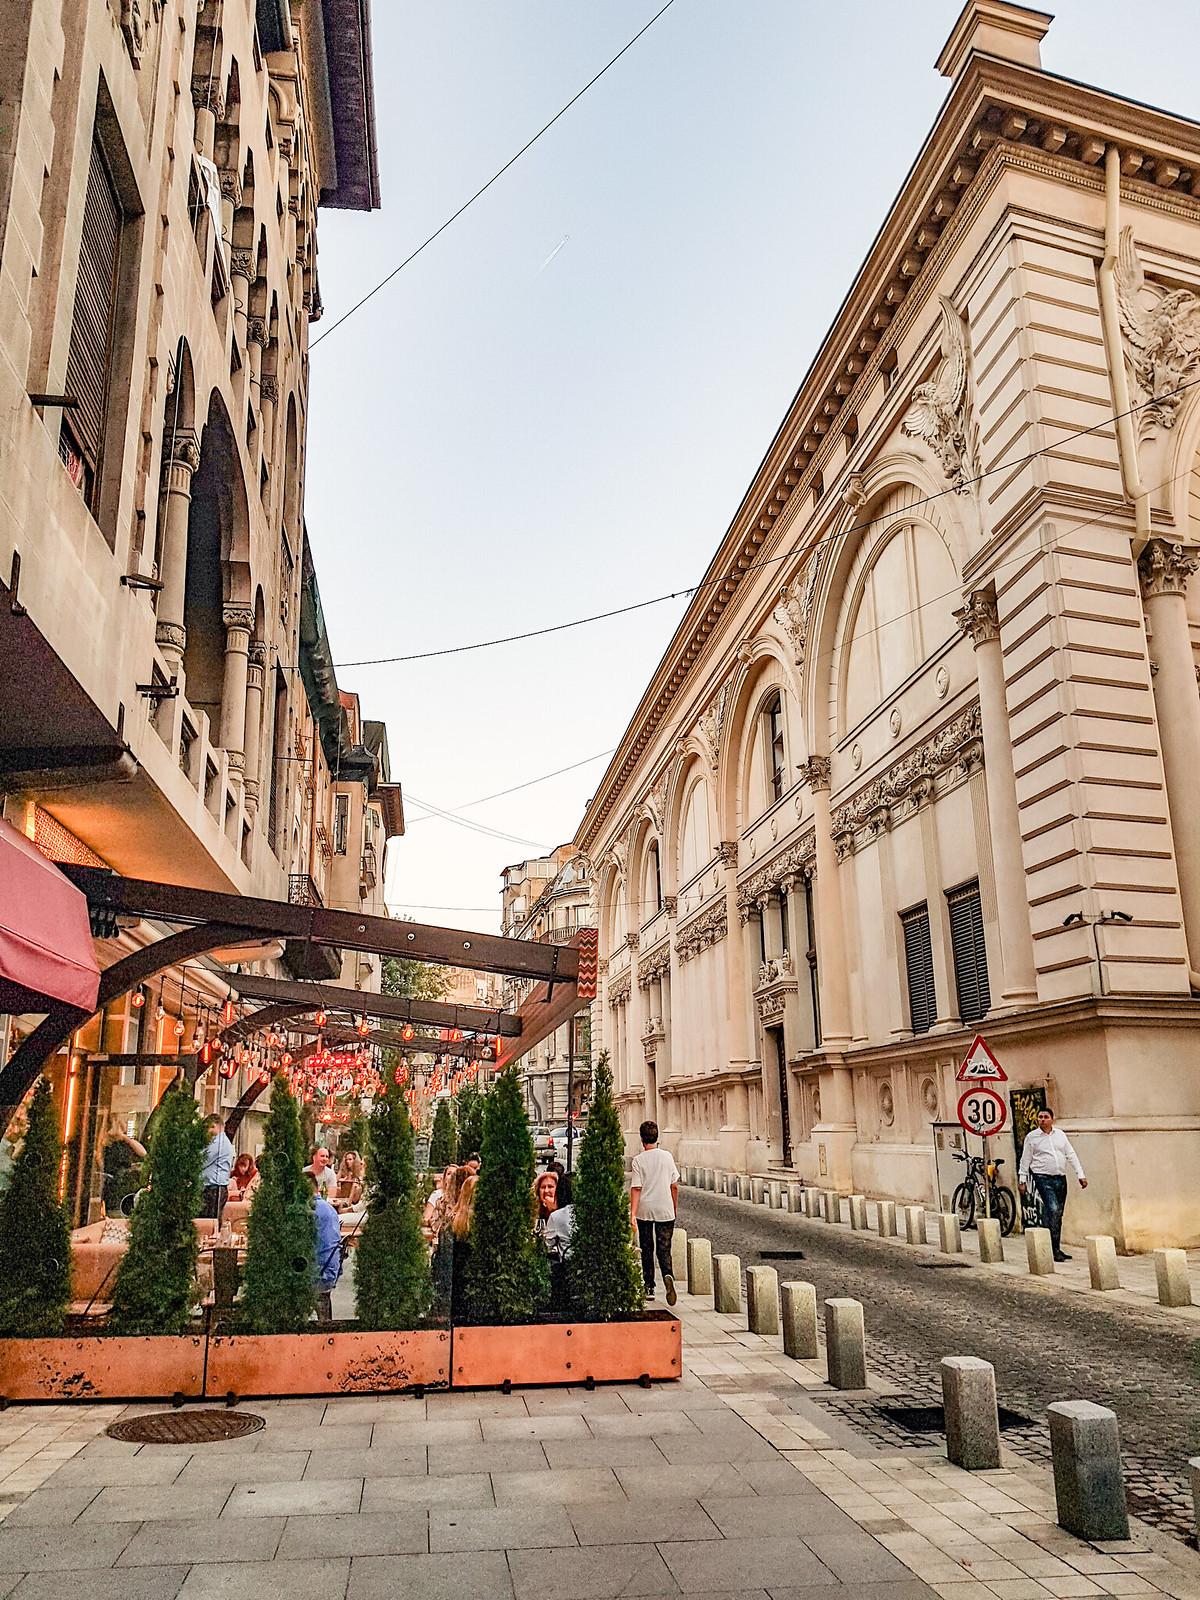 180913 - Bukarest